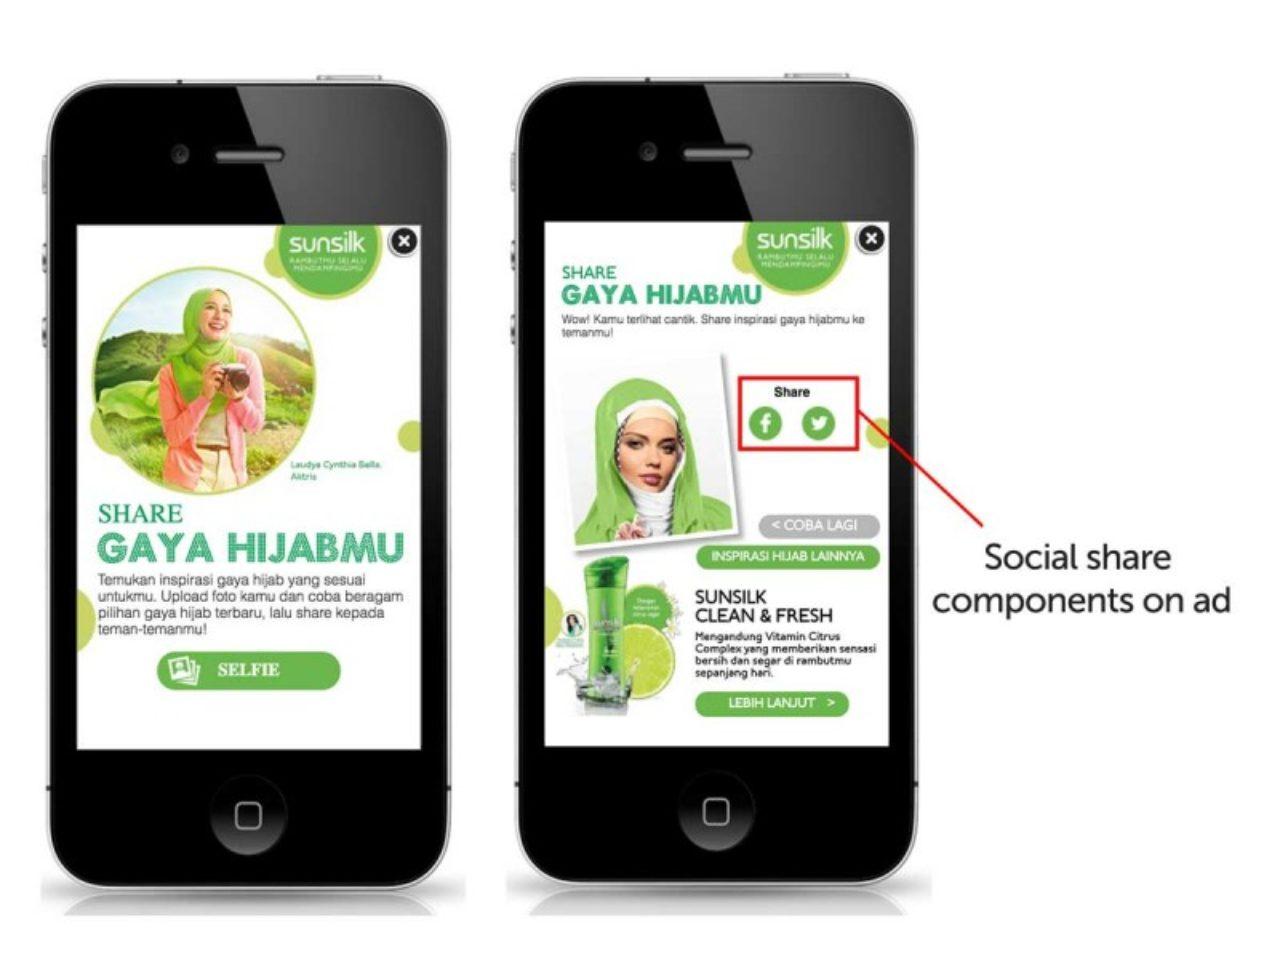 mobile conversion rates